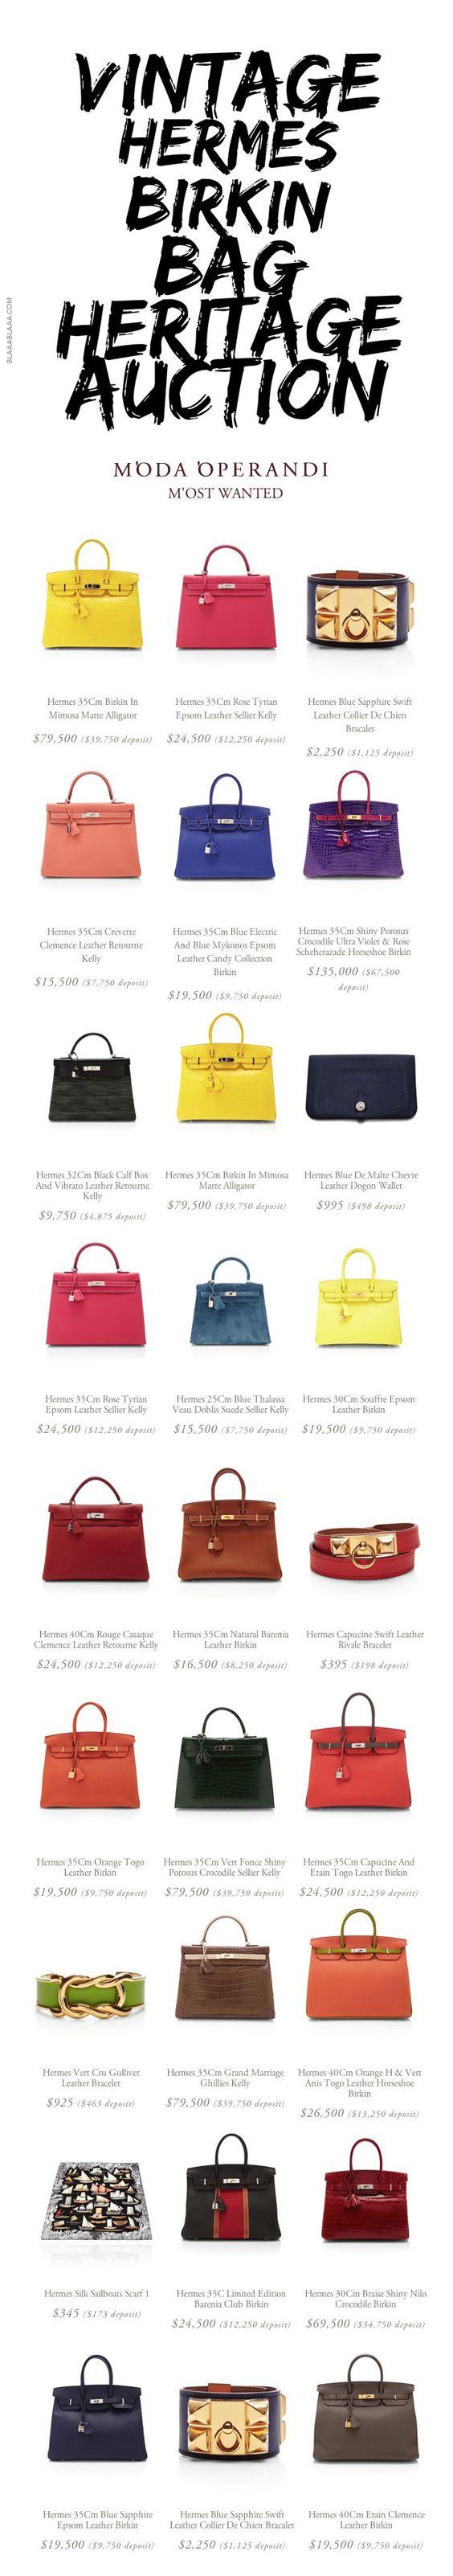 Vintage Hermès Birkin Bag Heritage Auction